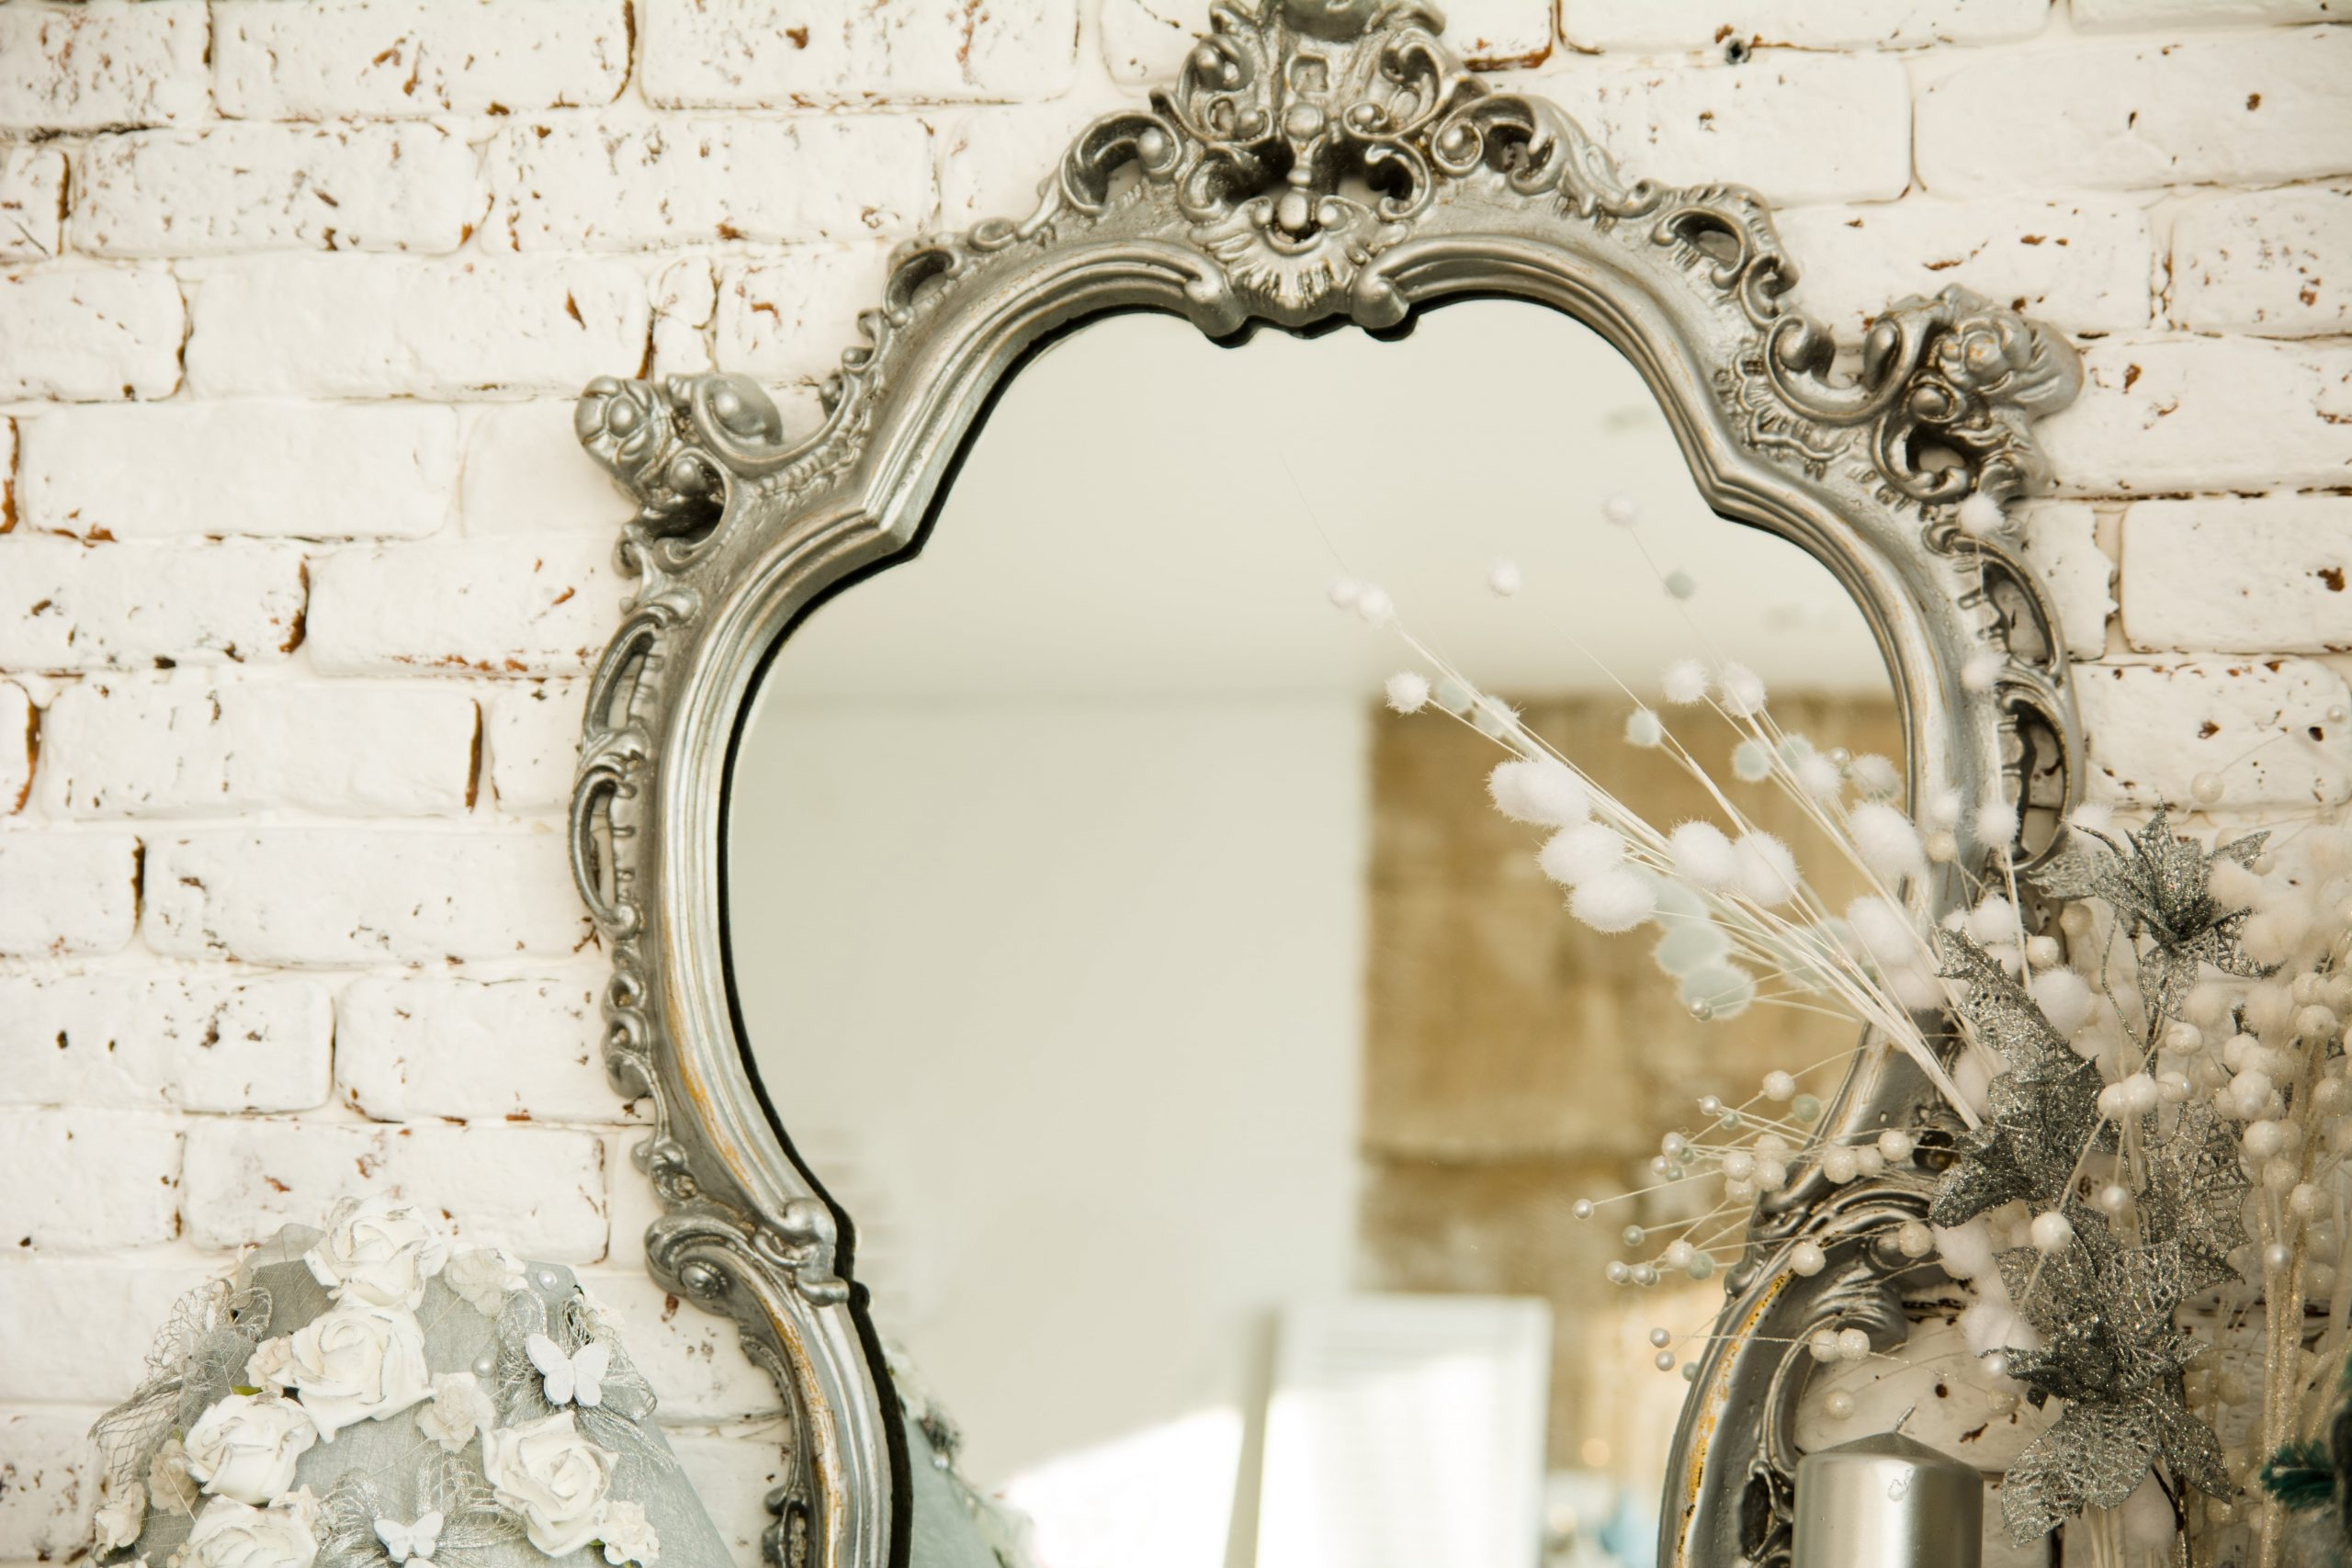 Decorative Mirror in white background